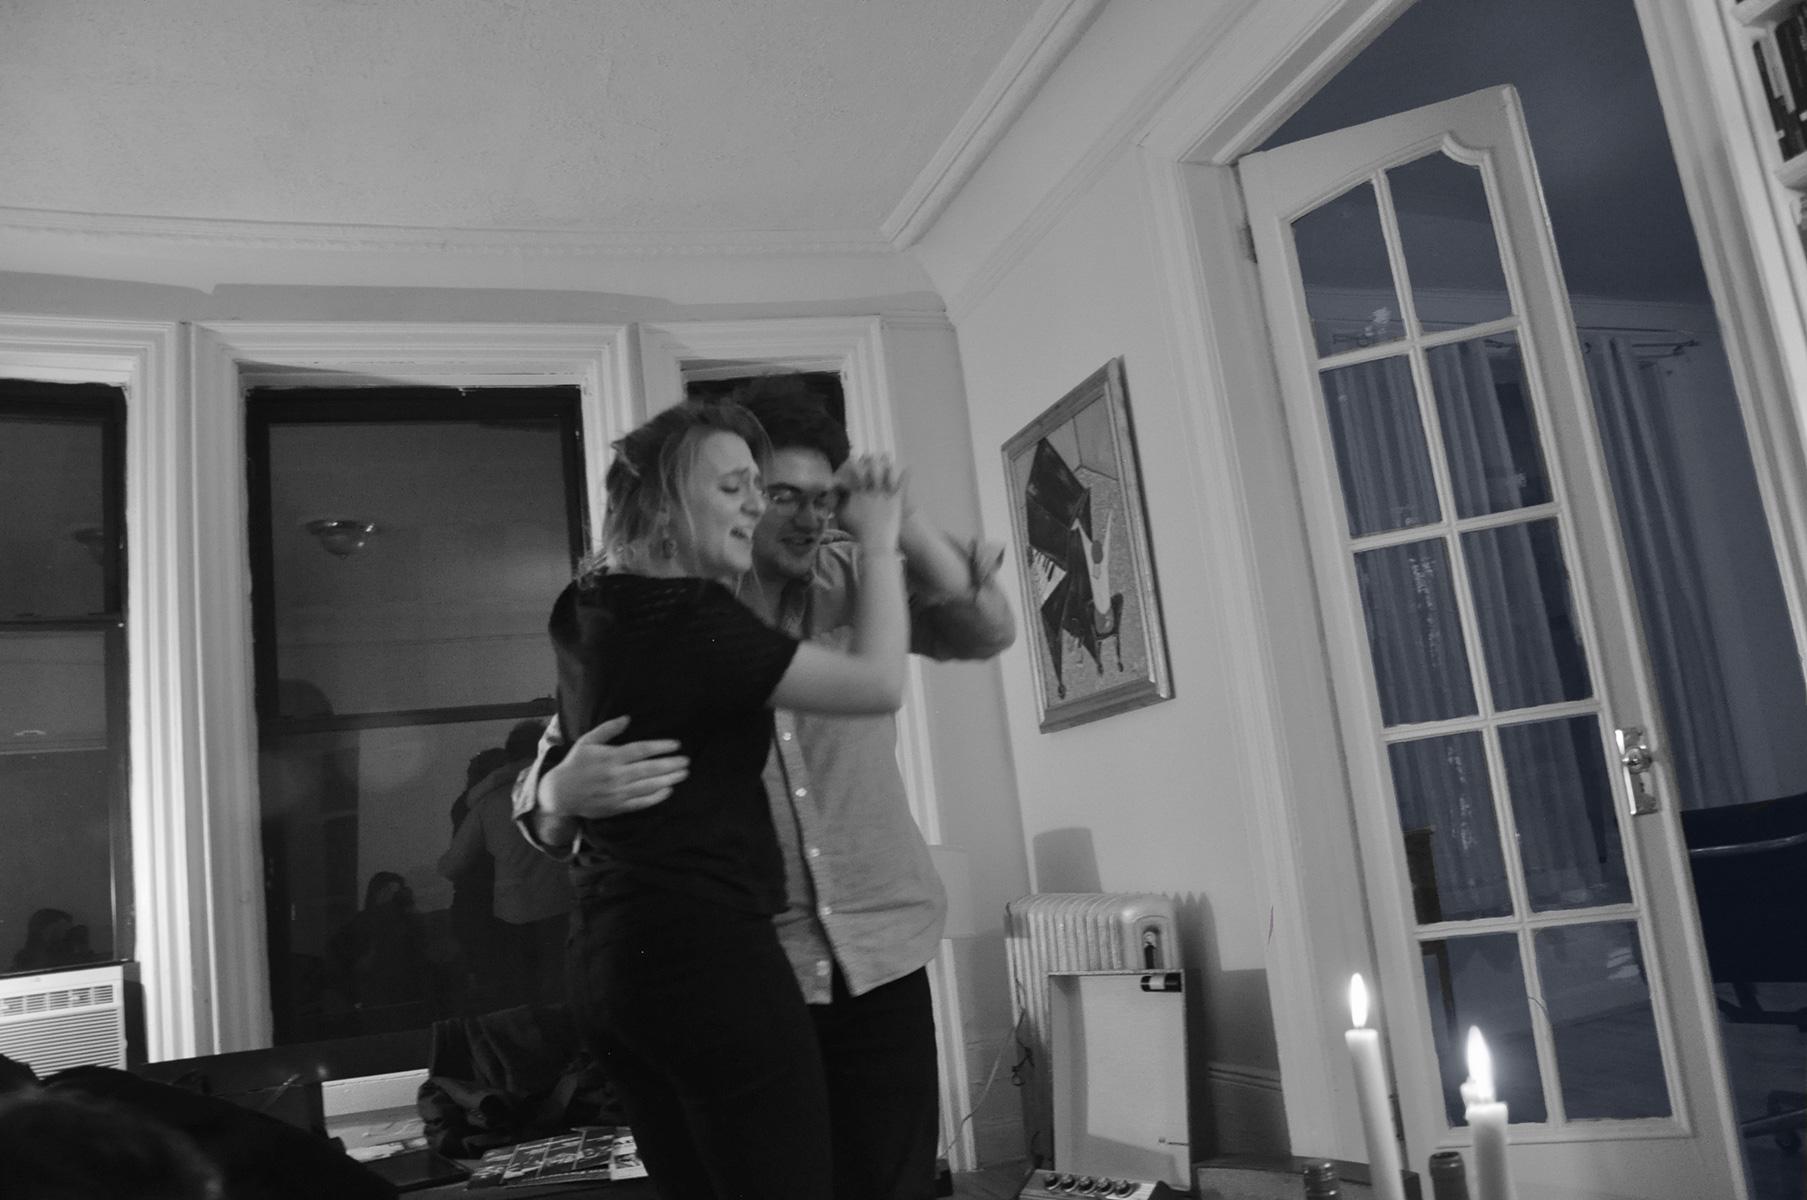 ANN_elianna_jac_dance_2